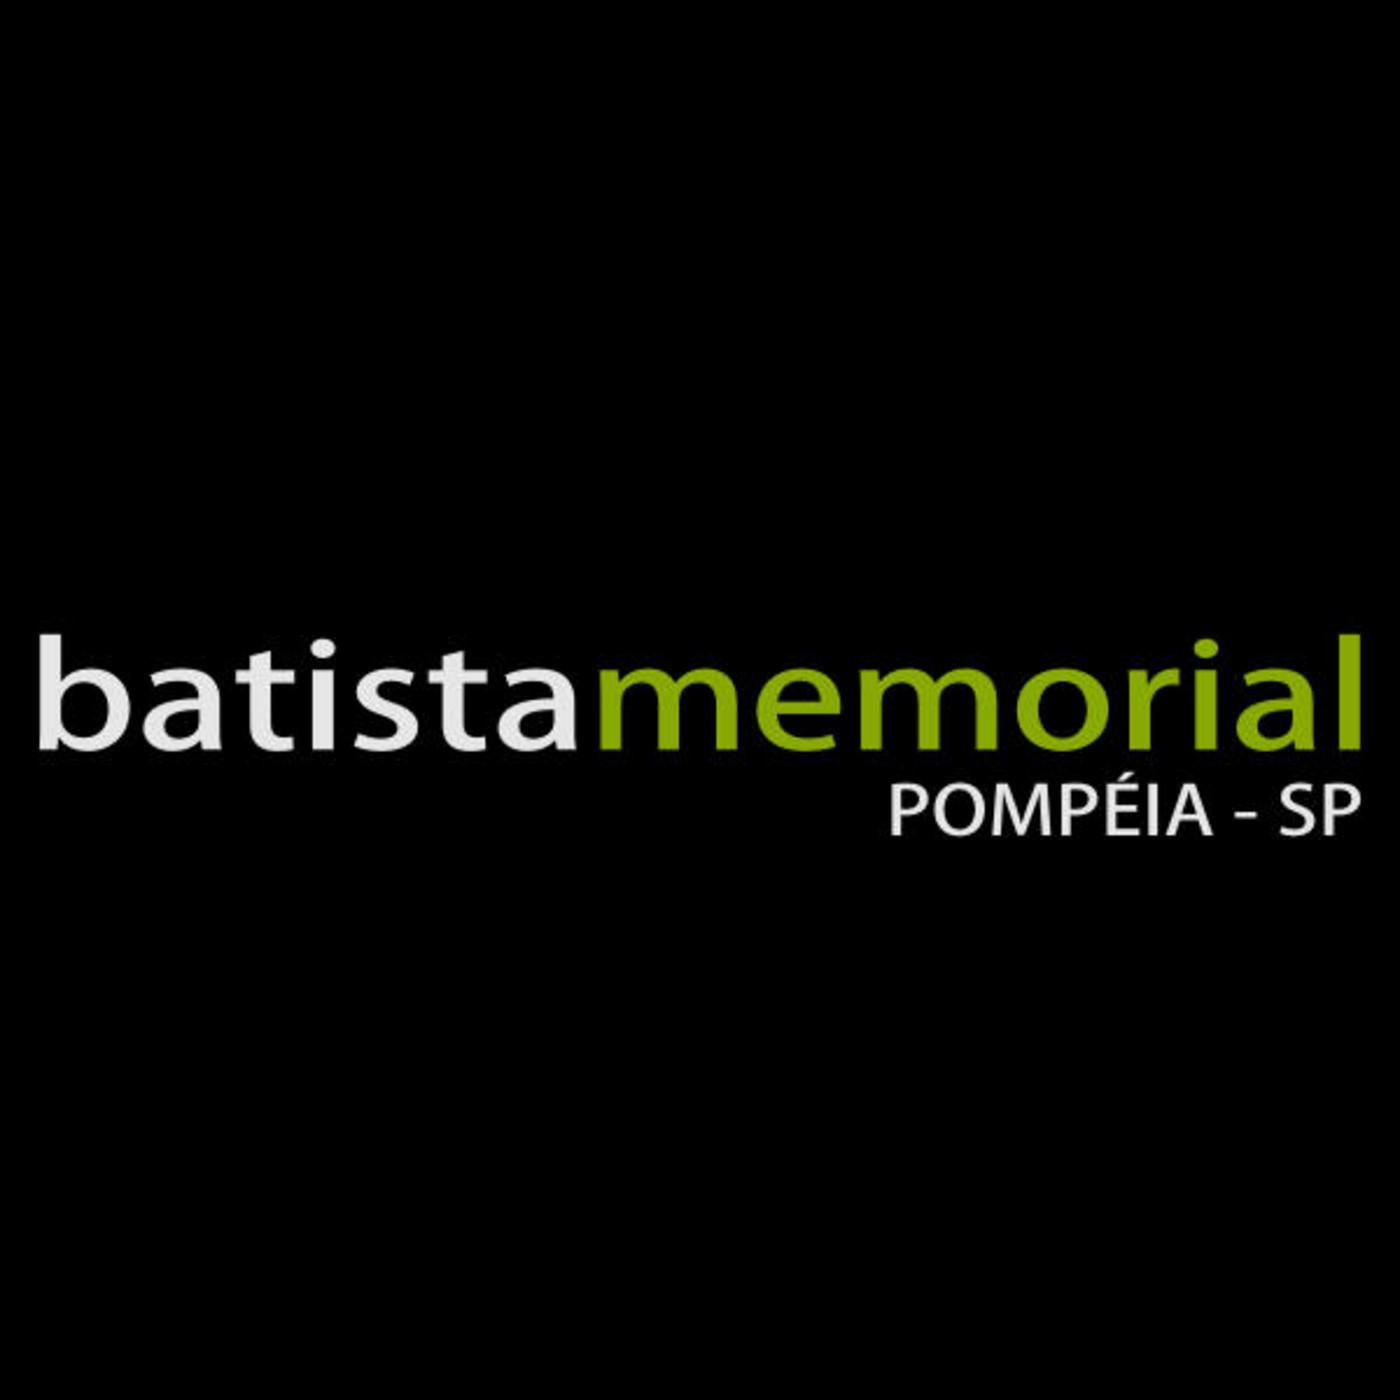 Igreja Batista Memorial